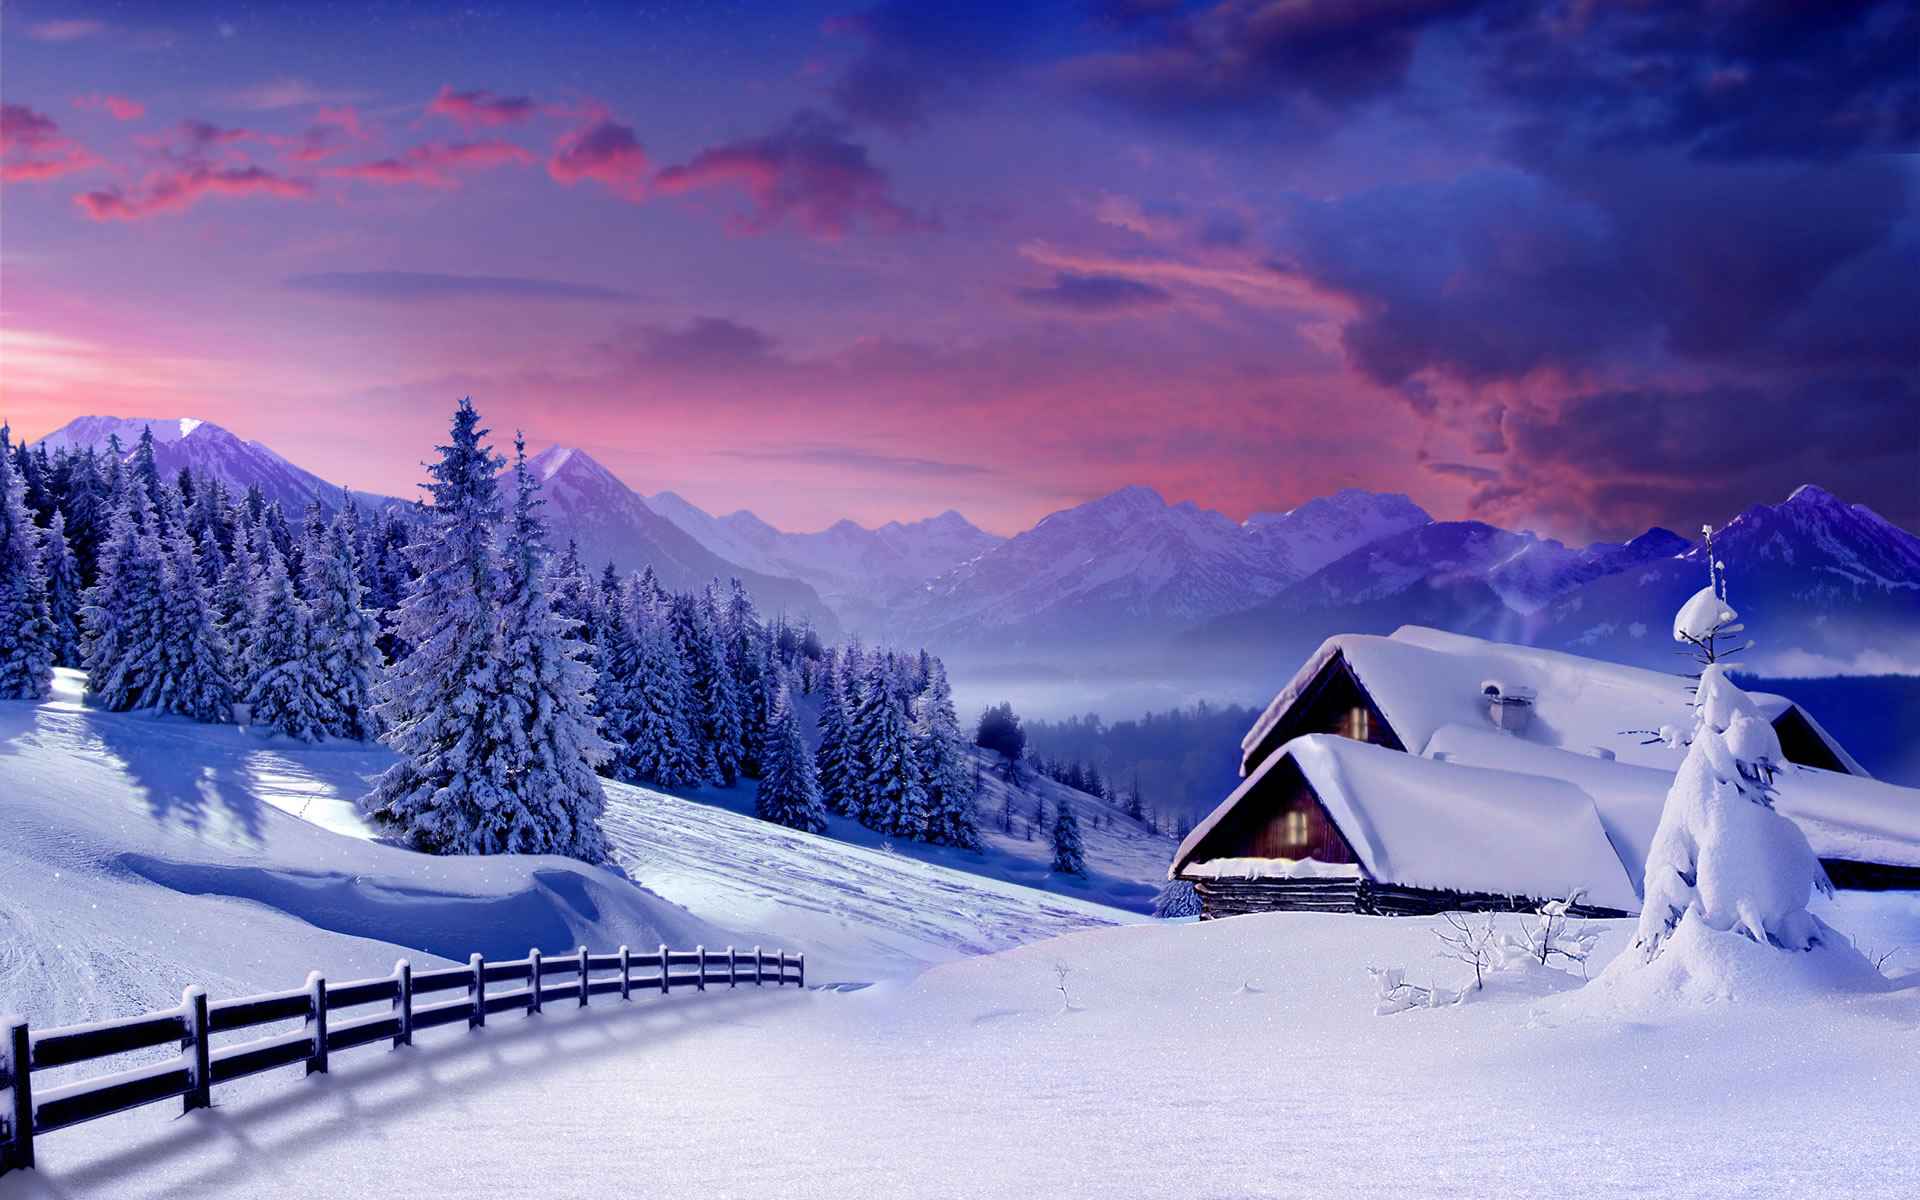 Winter In The Mountains Wallpaper 11107 Wallpaper Wallpaper hd 1920x1200